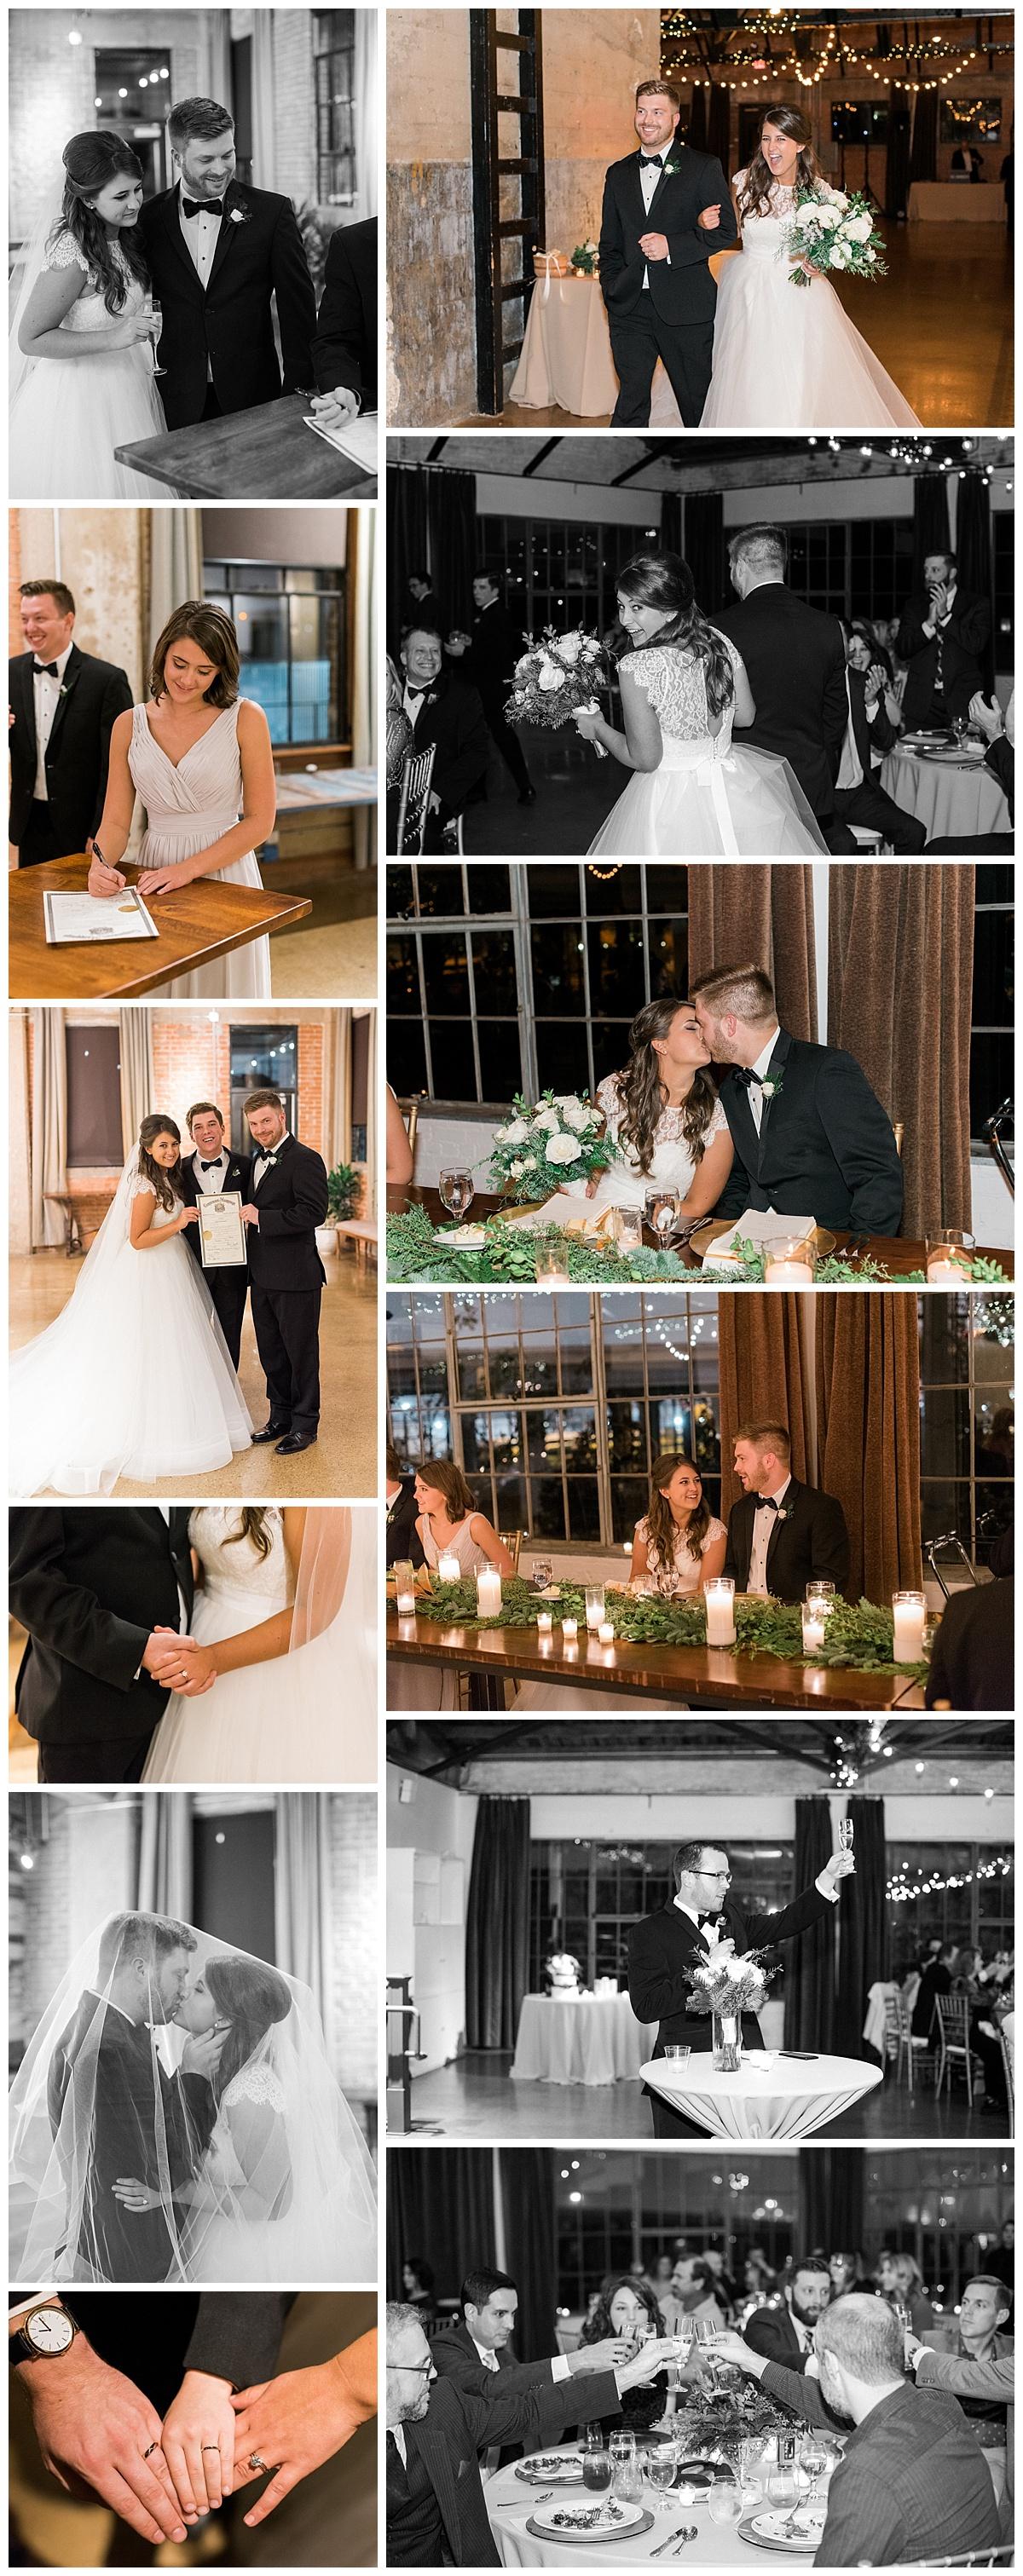 hickory-street-annex-wedding-ar-photography-13.jpg